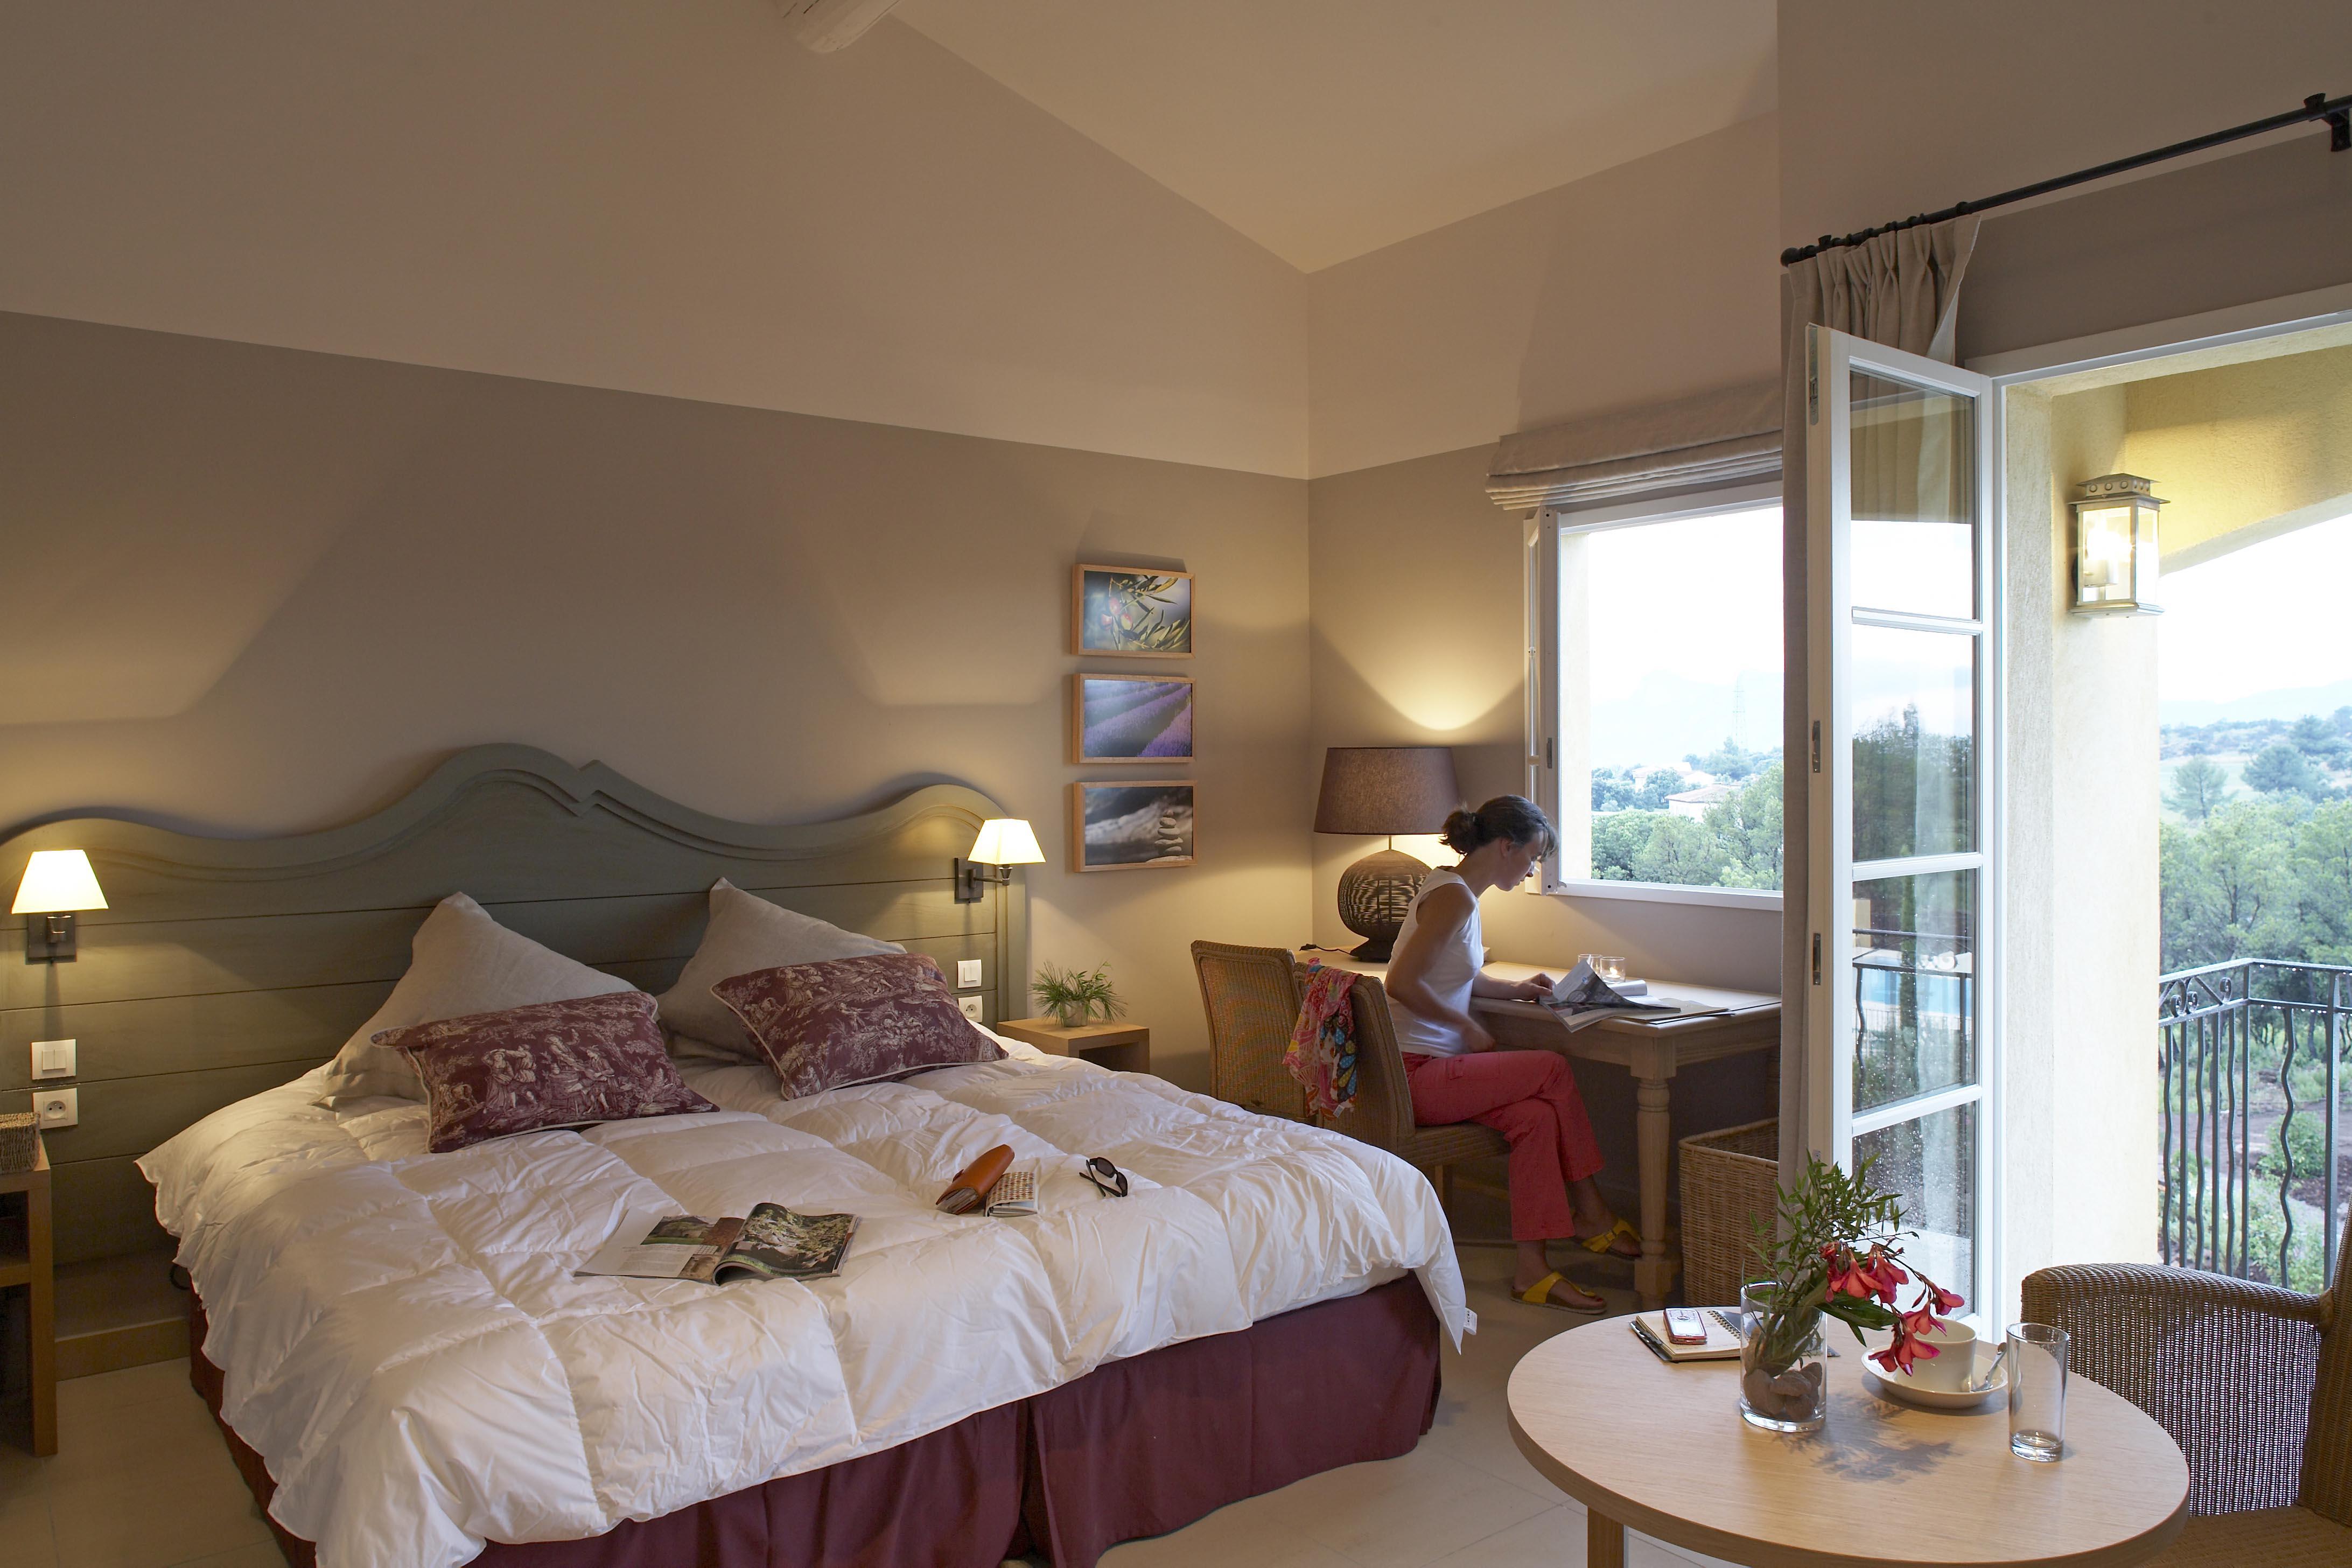 golf-expedition-golf-reizen-frankrijk-regio-cote-d'azur-Les-Domaines-de-Saint-Endréol-Golf-en-Spa-Resort-stijlvolle-slaapkamer-met-balkon